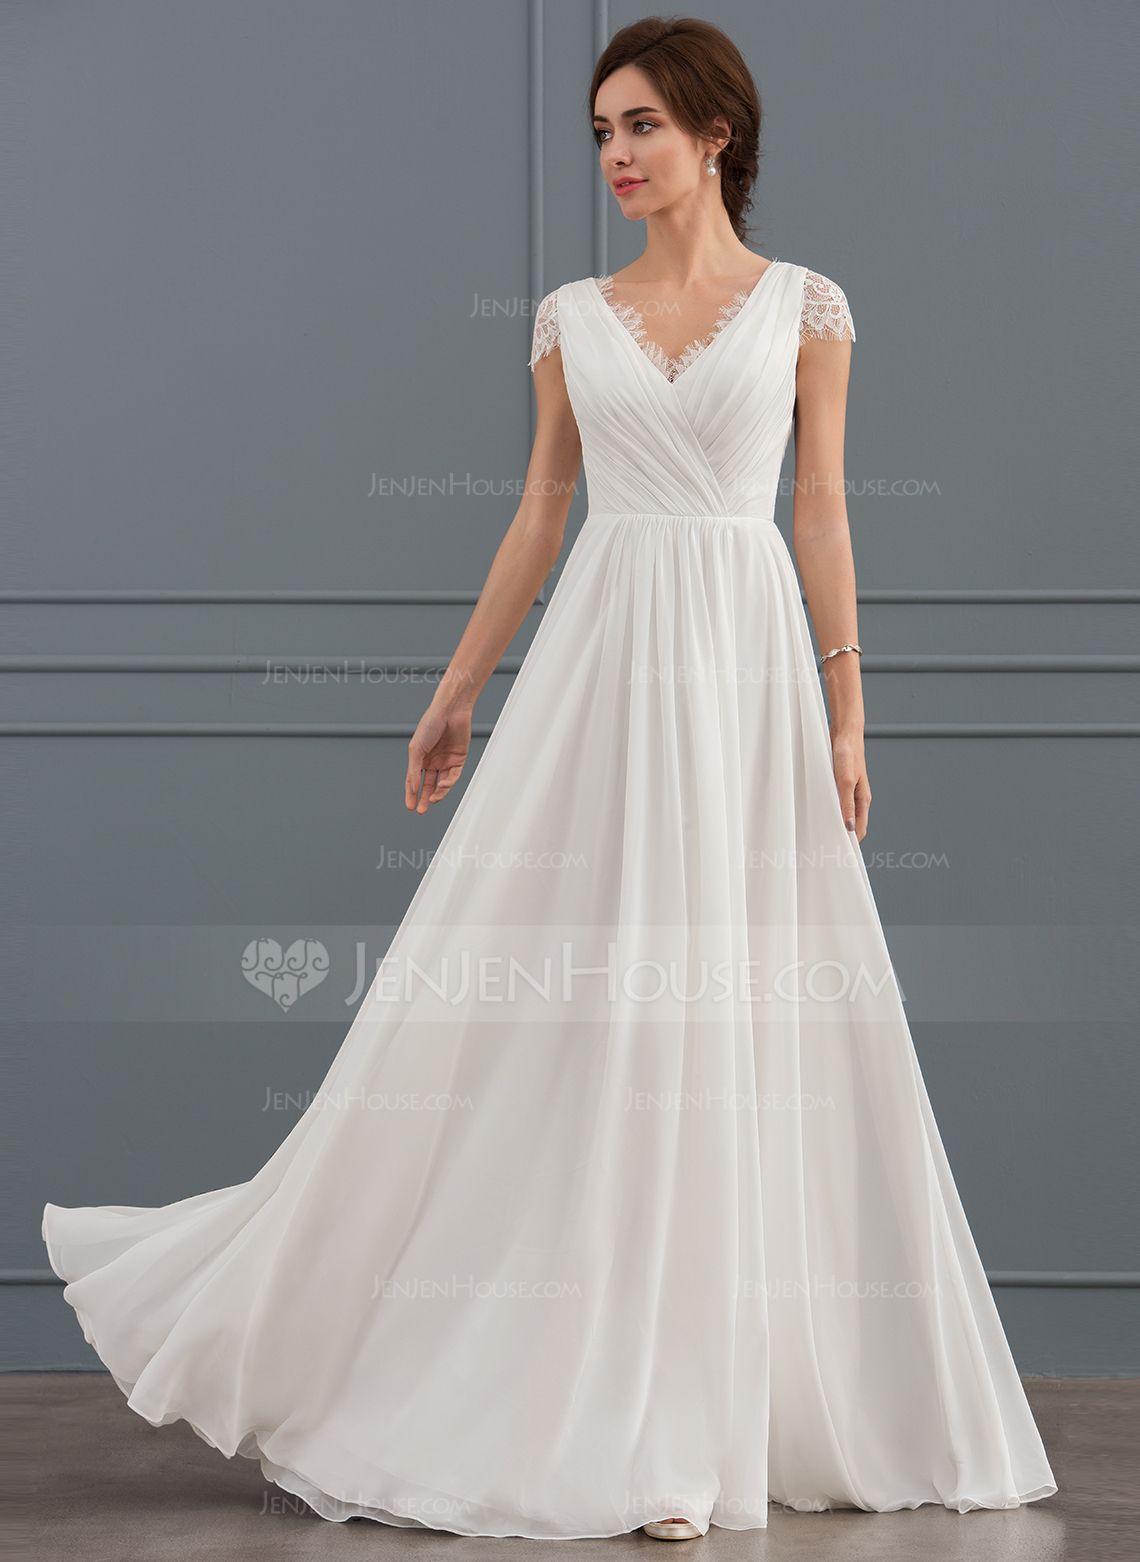 ALine Vneck FloorLength Chiffon Lace Wedding Dress With